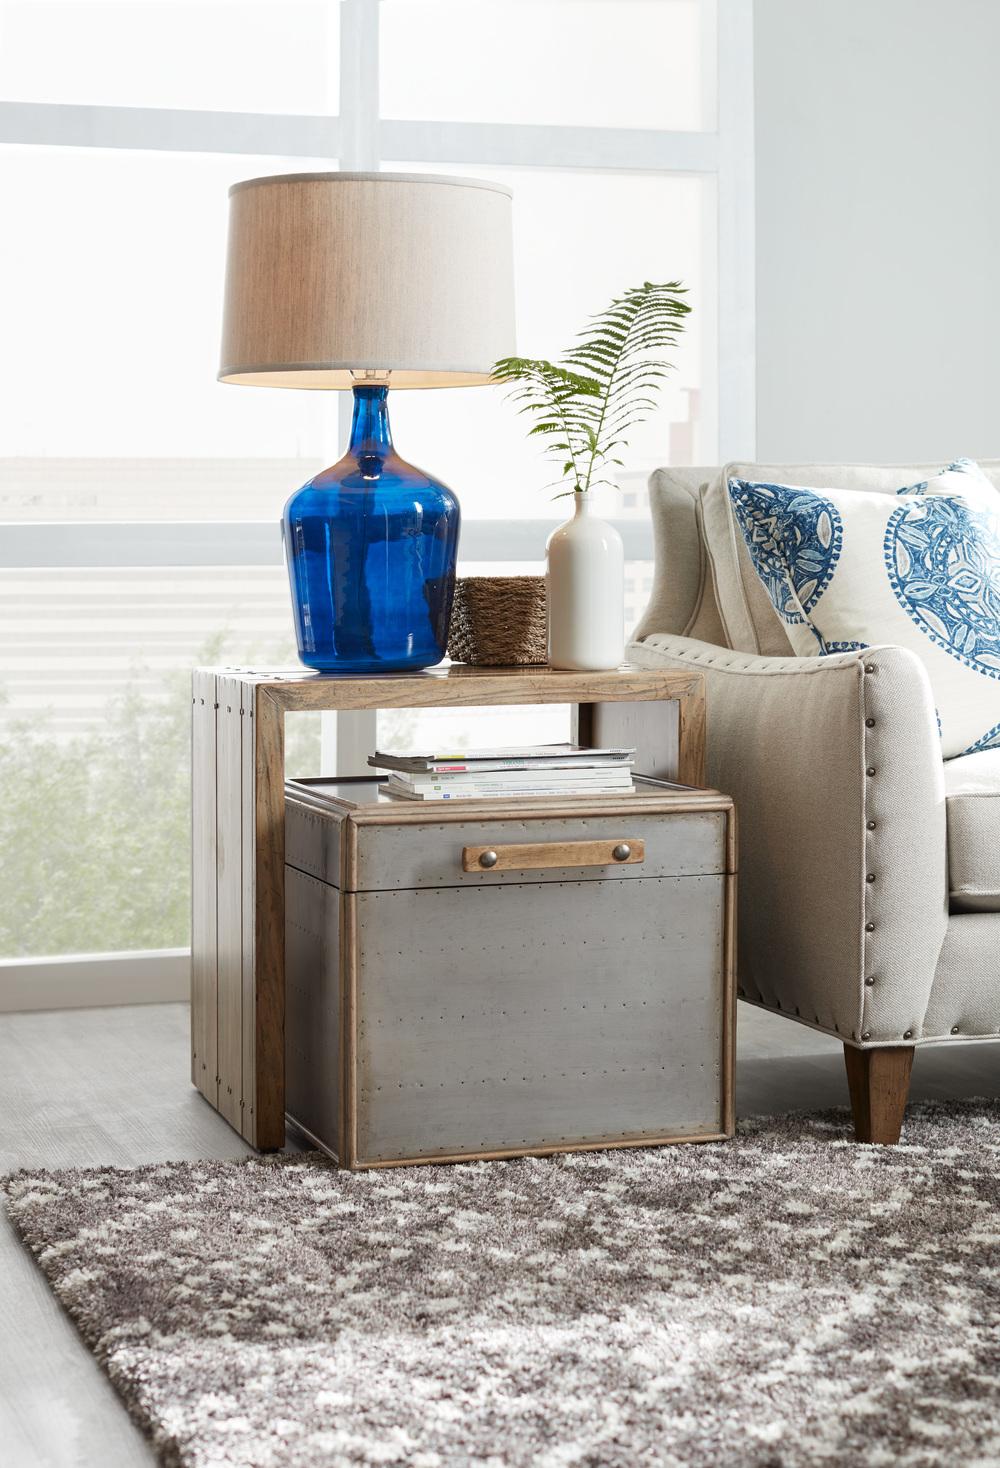 Hooker Furniture - Nesting/Storage Table